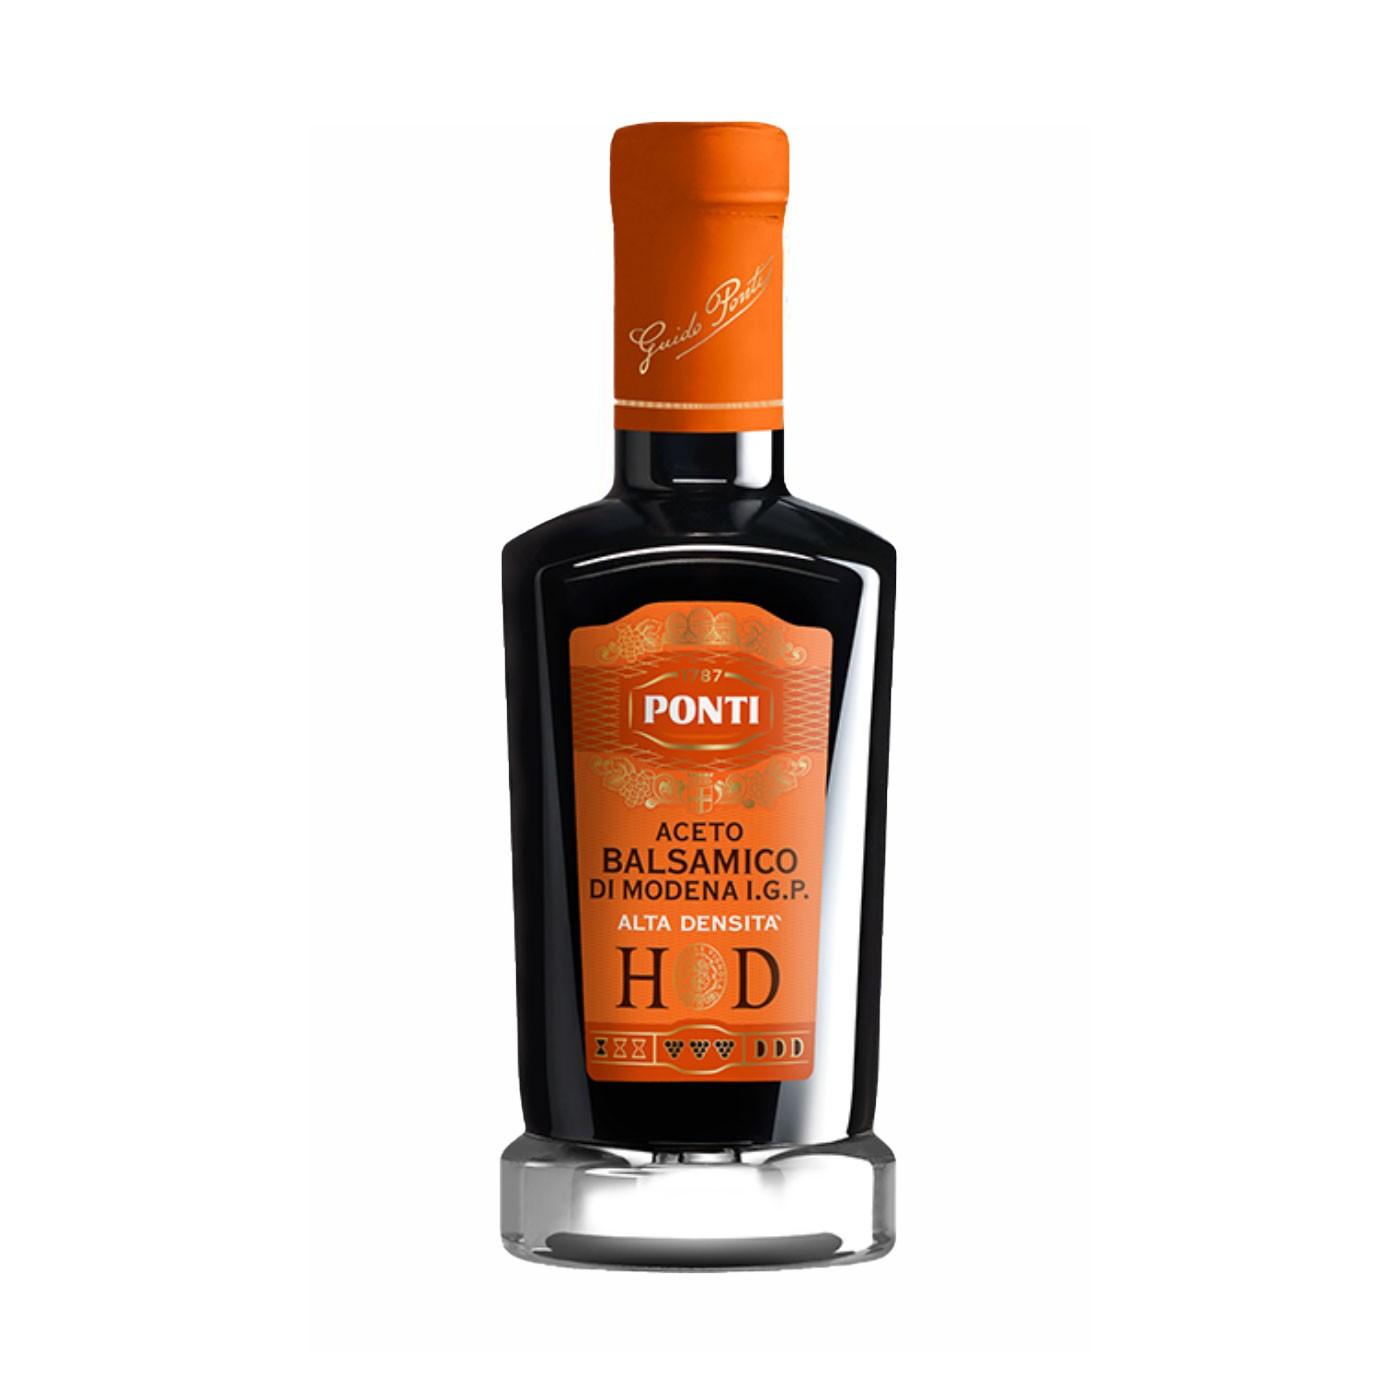 Modena Balsamic Vinegar, High Density 8 oz